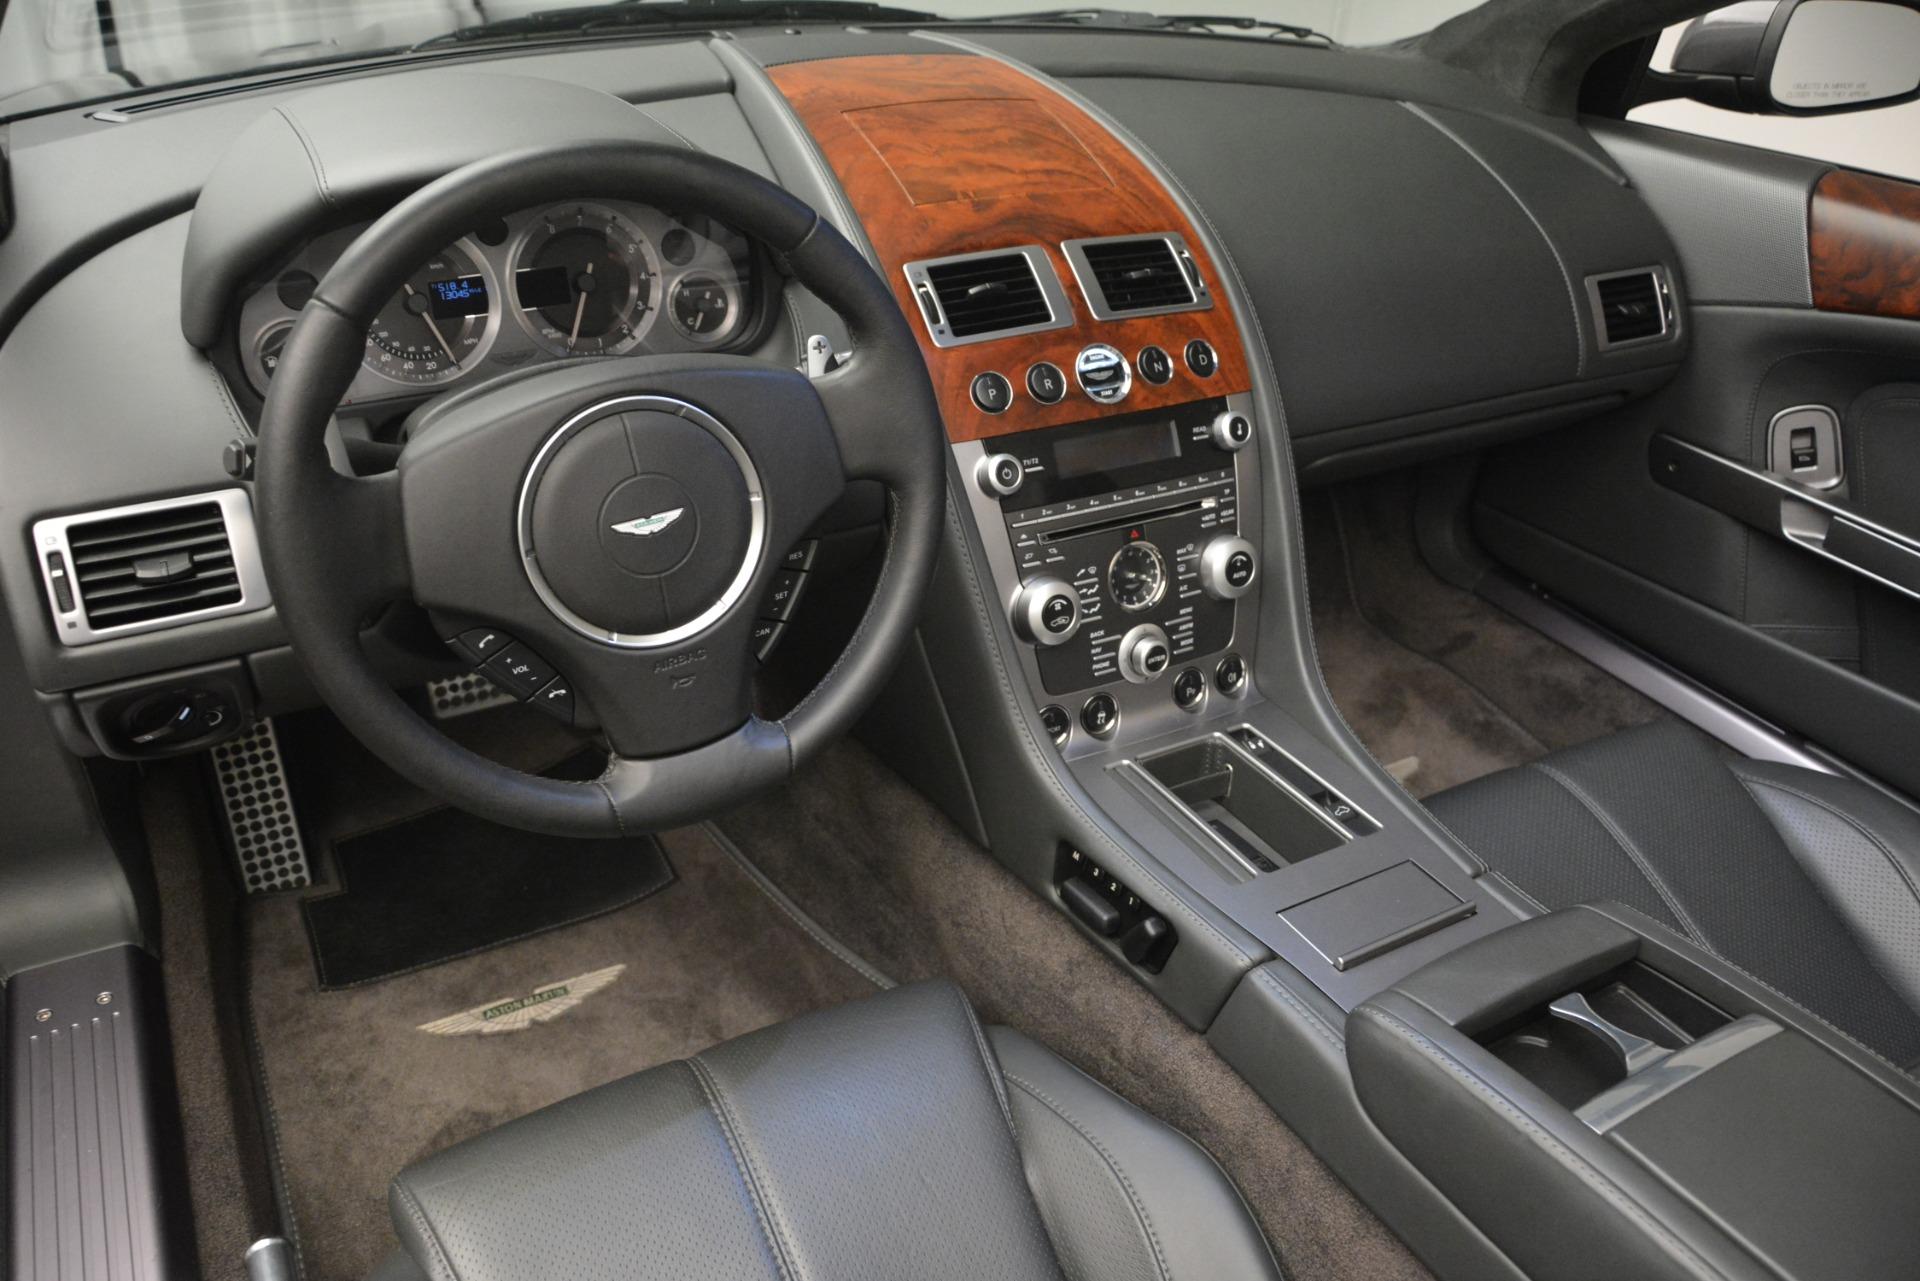 Used 2009 Aston Martin DB9 Convertible